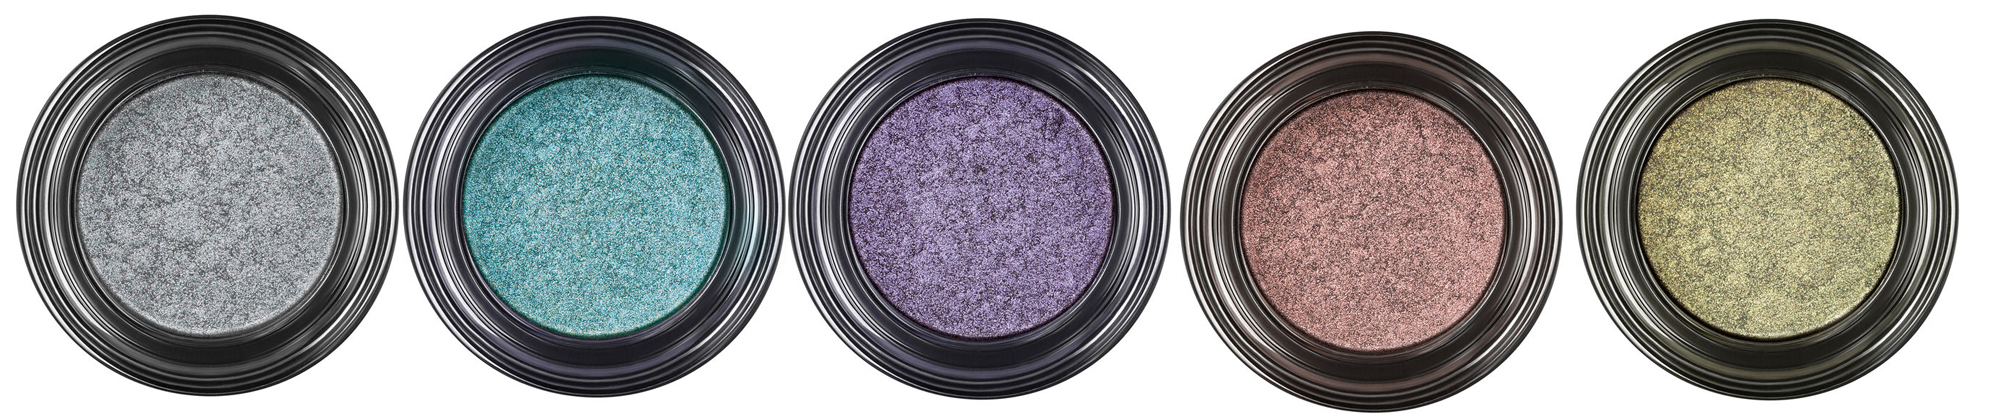 Giorgio Armani Kaleidoscope Makeup Collection for Fall 2013 eyes to kill